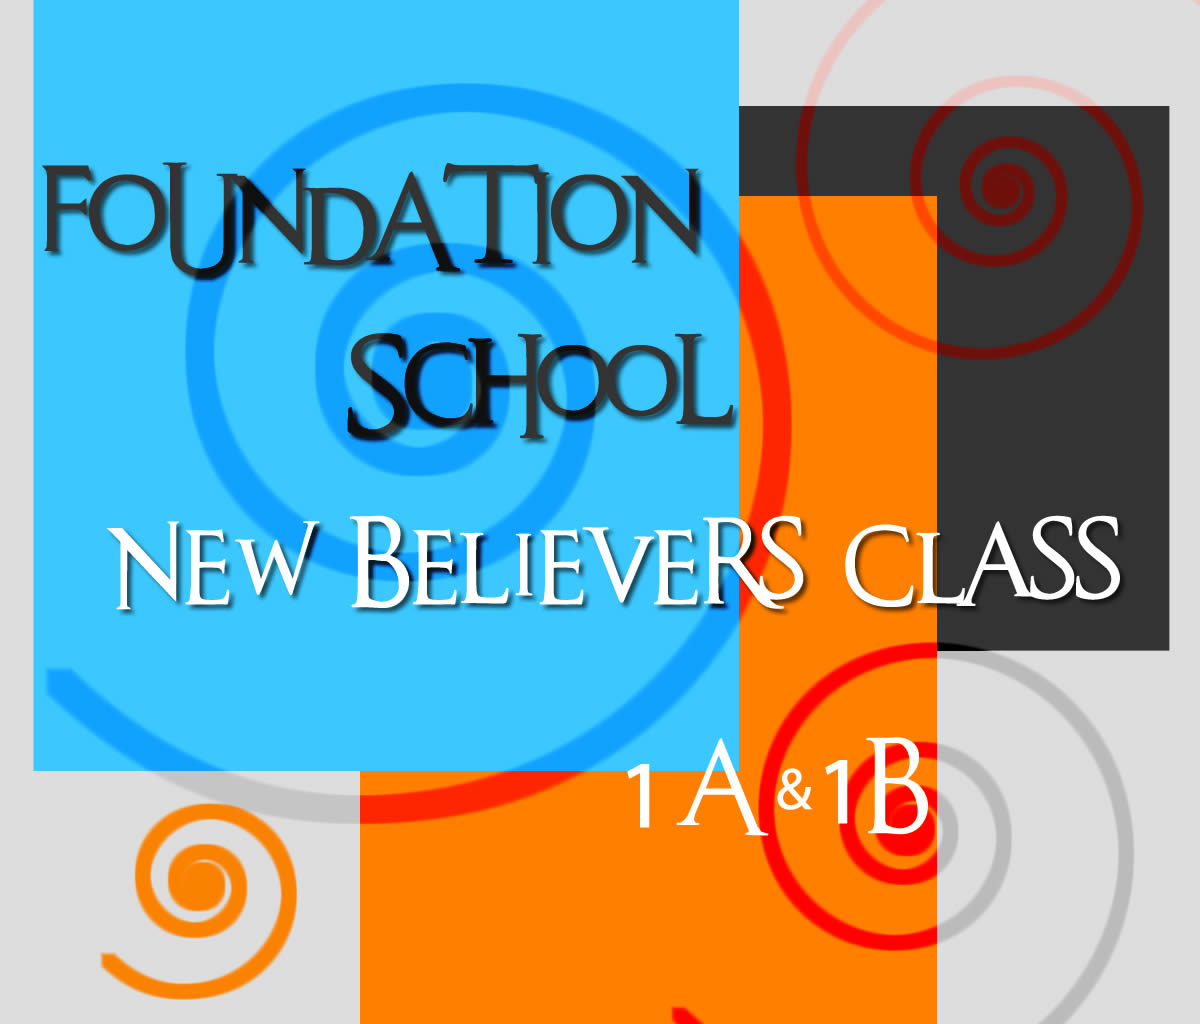 FOUNDATION SCHOOL CLASS 1